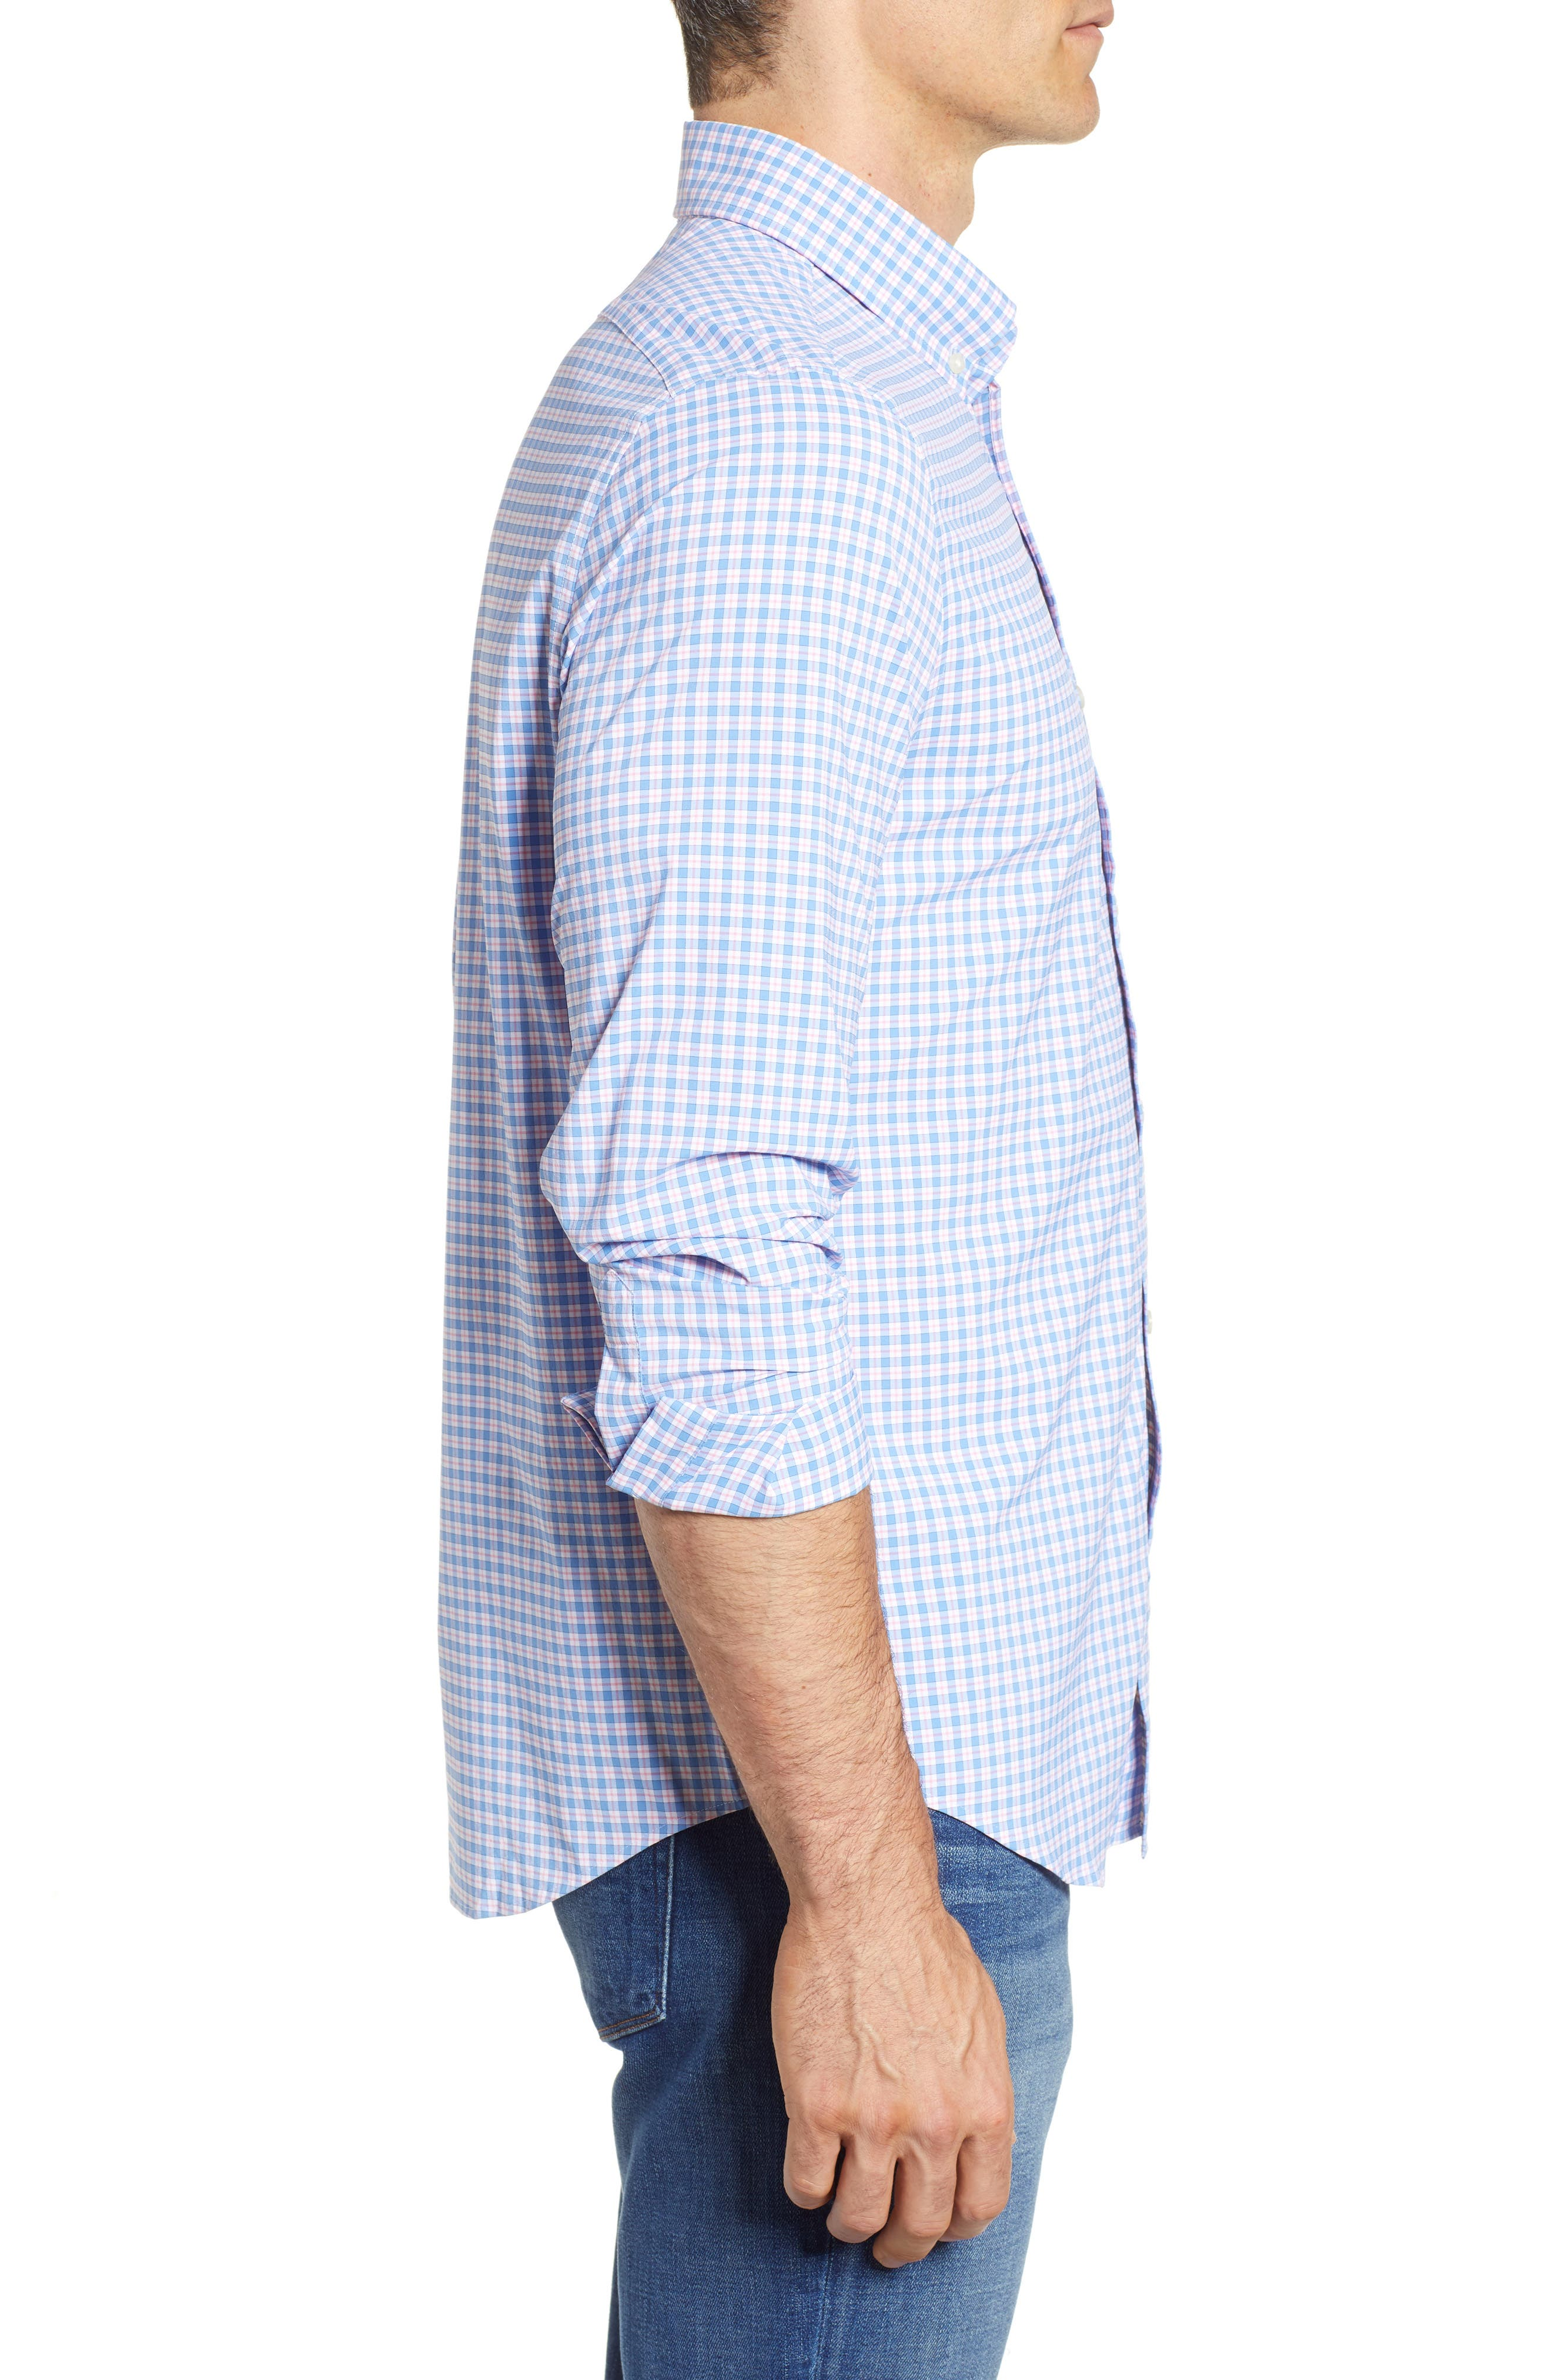 Oyster Pond Slim Fit Plaid Sport Shirt,                             Alternate thumbnail 3, color,                             OCEAN BREEZE